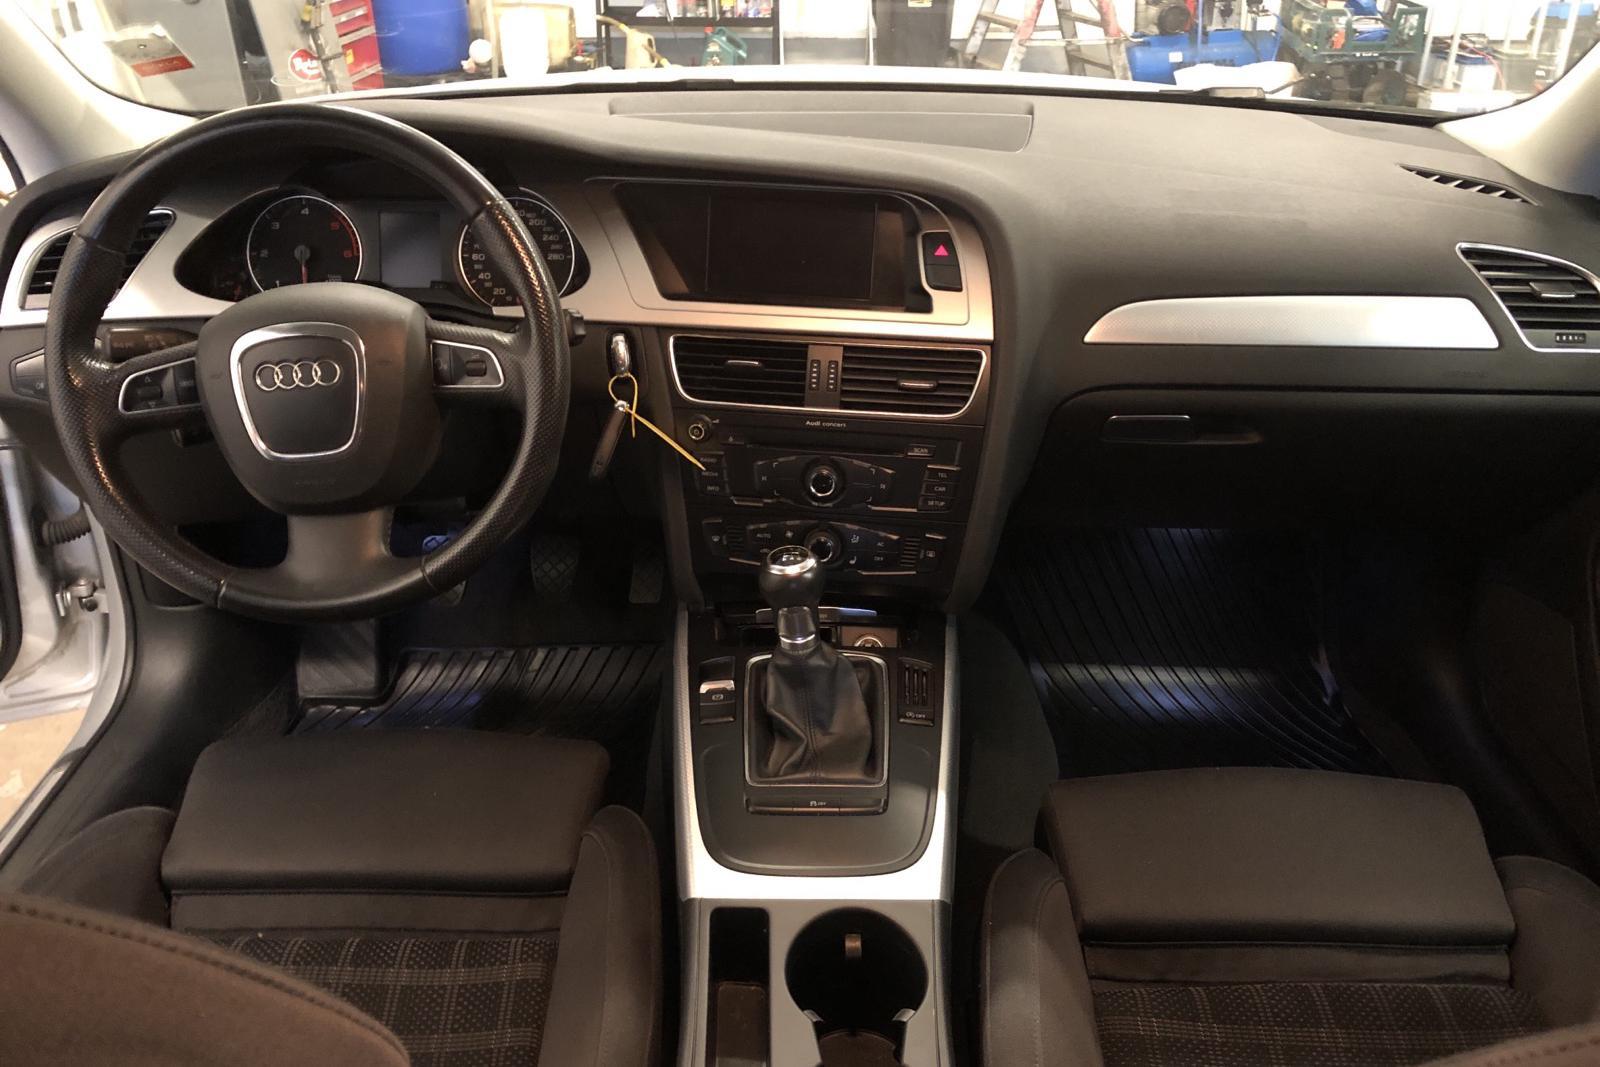 Audi A4 2.0 TDI e Avant (136hk) - 151 720 km - Manual - silver - 2011